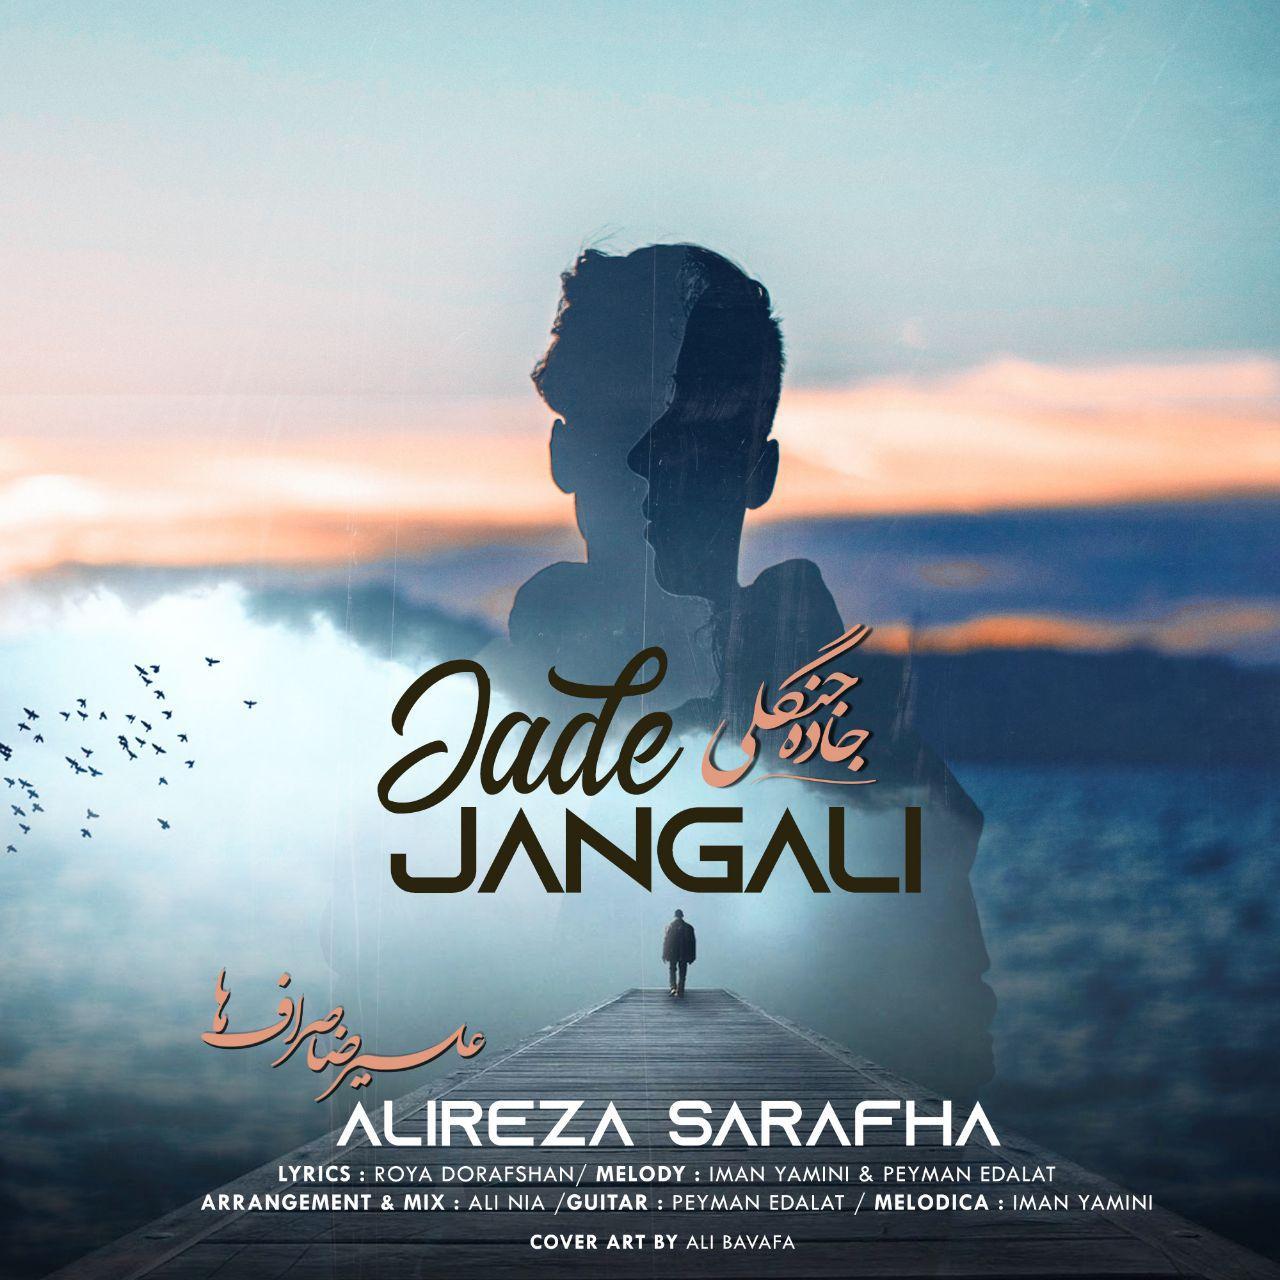 Alireza Sarafha – Jade Jangali